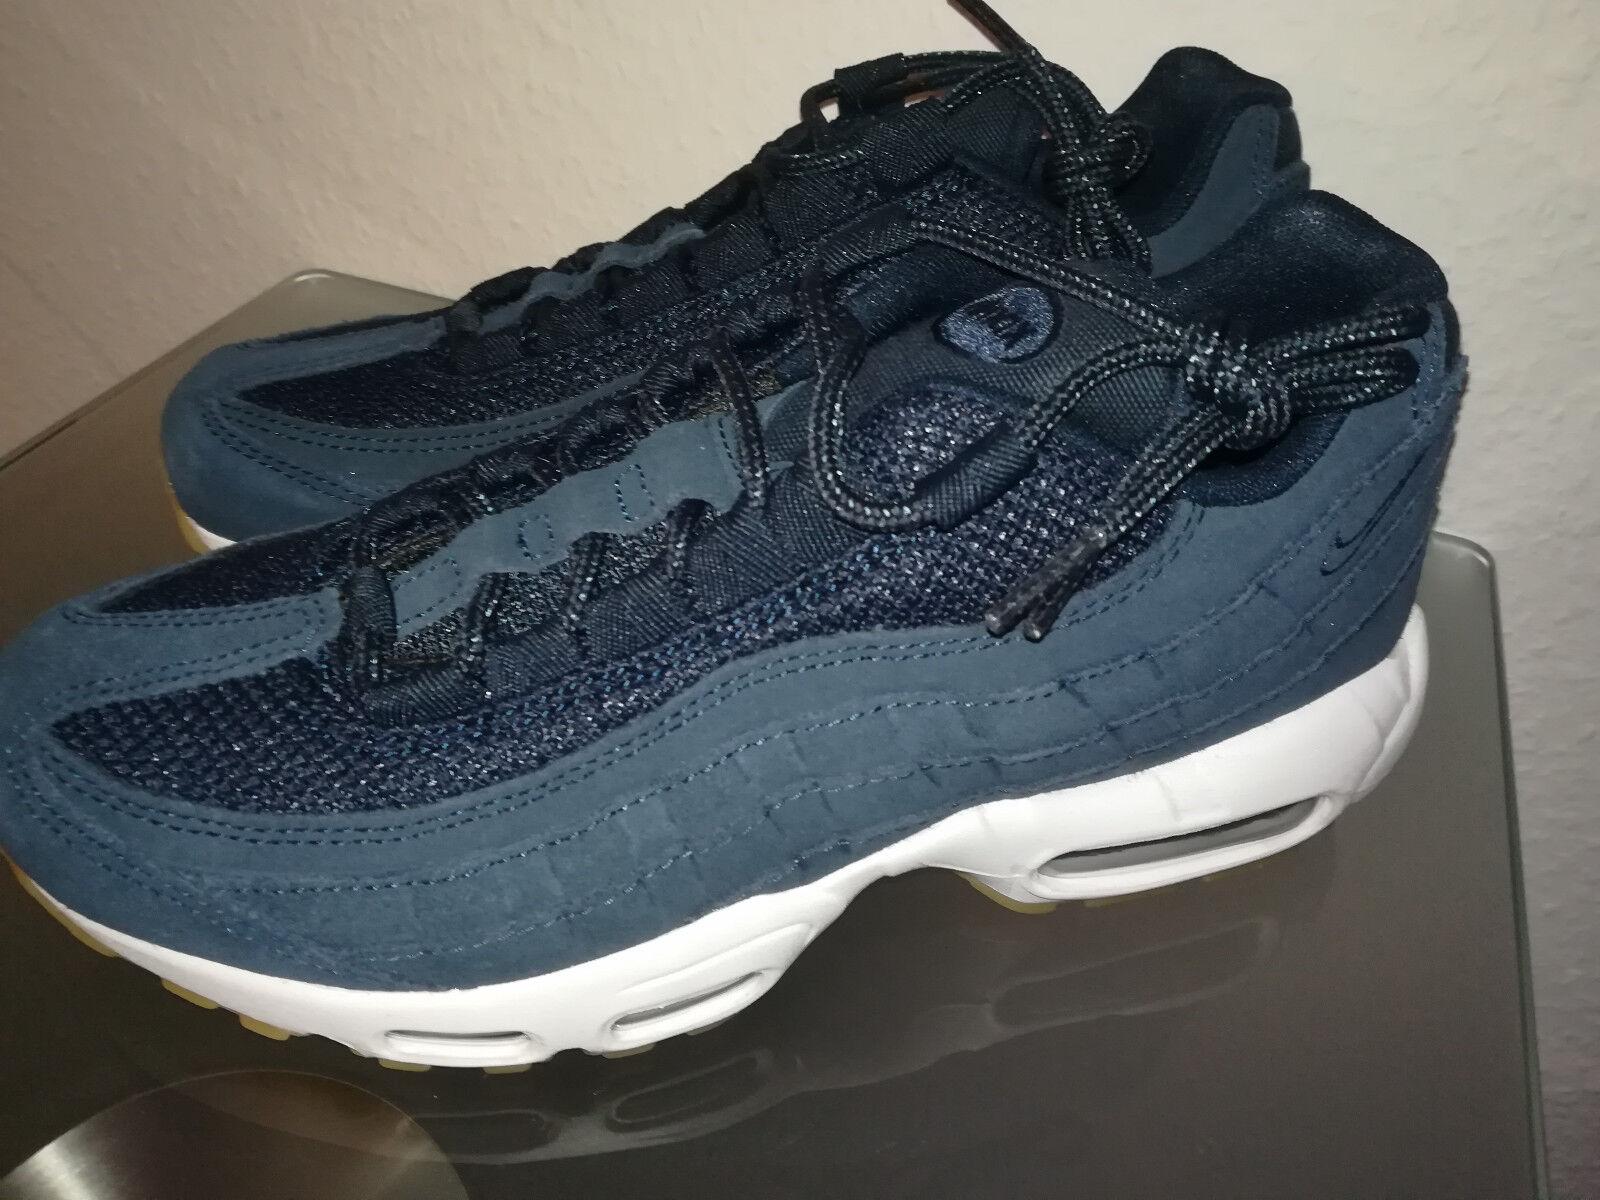 Herren Nike Air Max Neu 95 Premium 538416-402 Blau Schuhe Neu Max Gr.40 933542